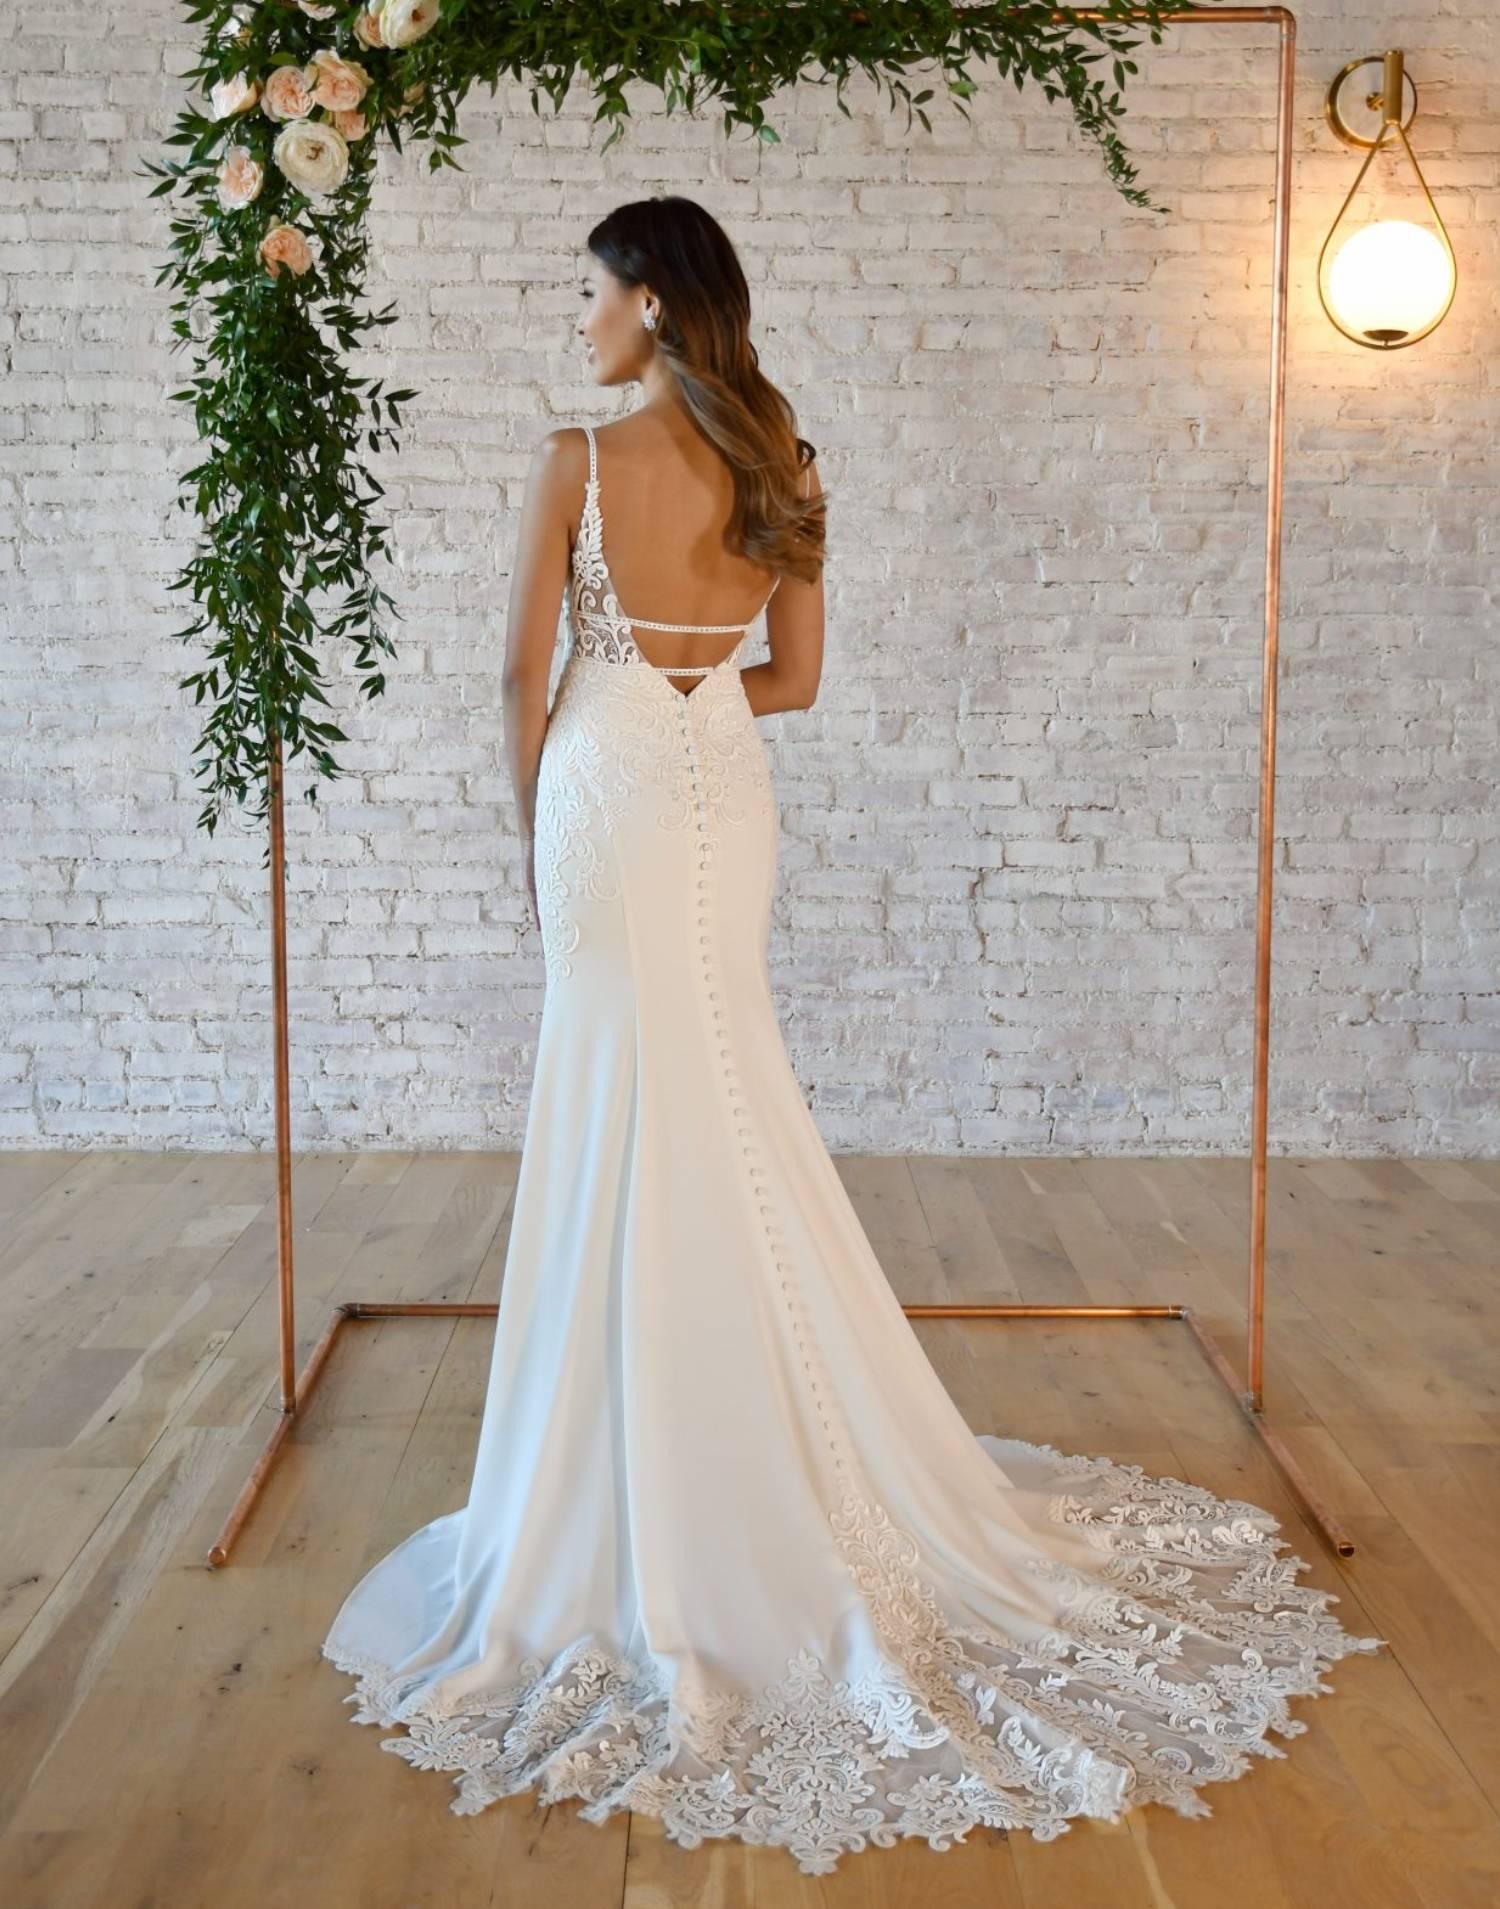 7324-wedding-dress-Stella-York-front-view-min